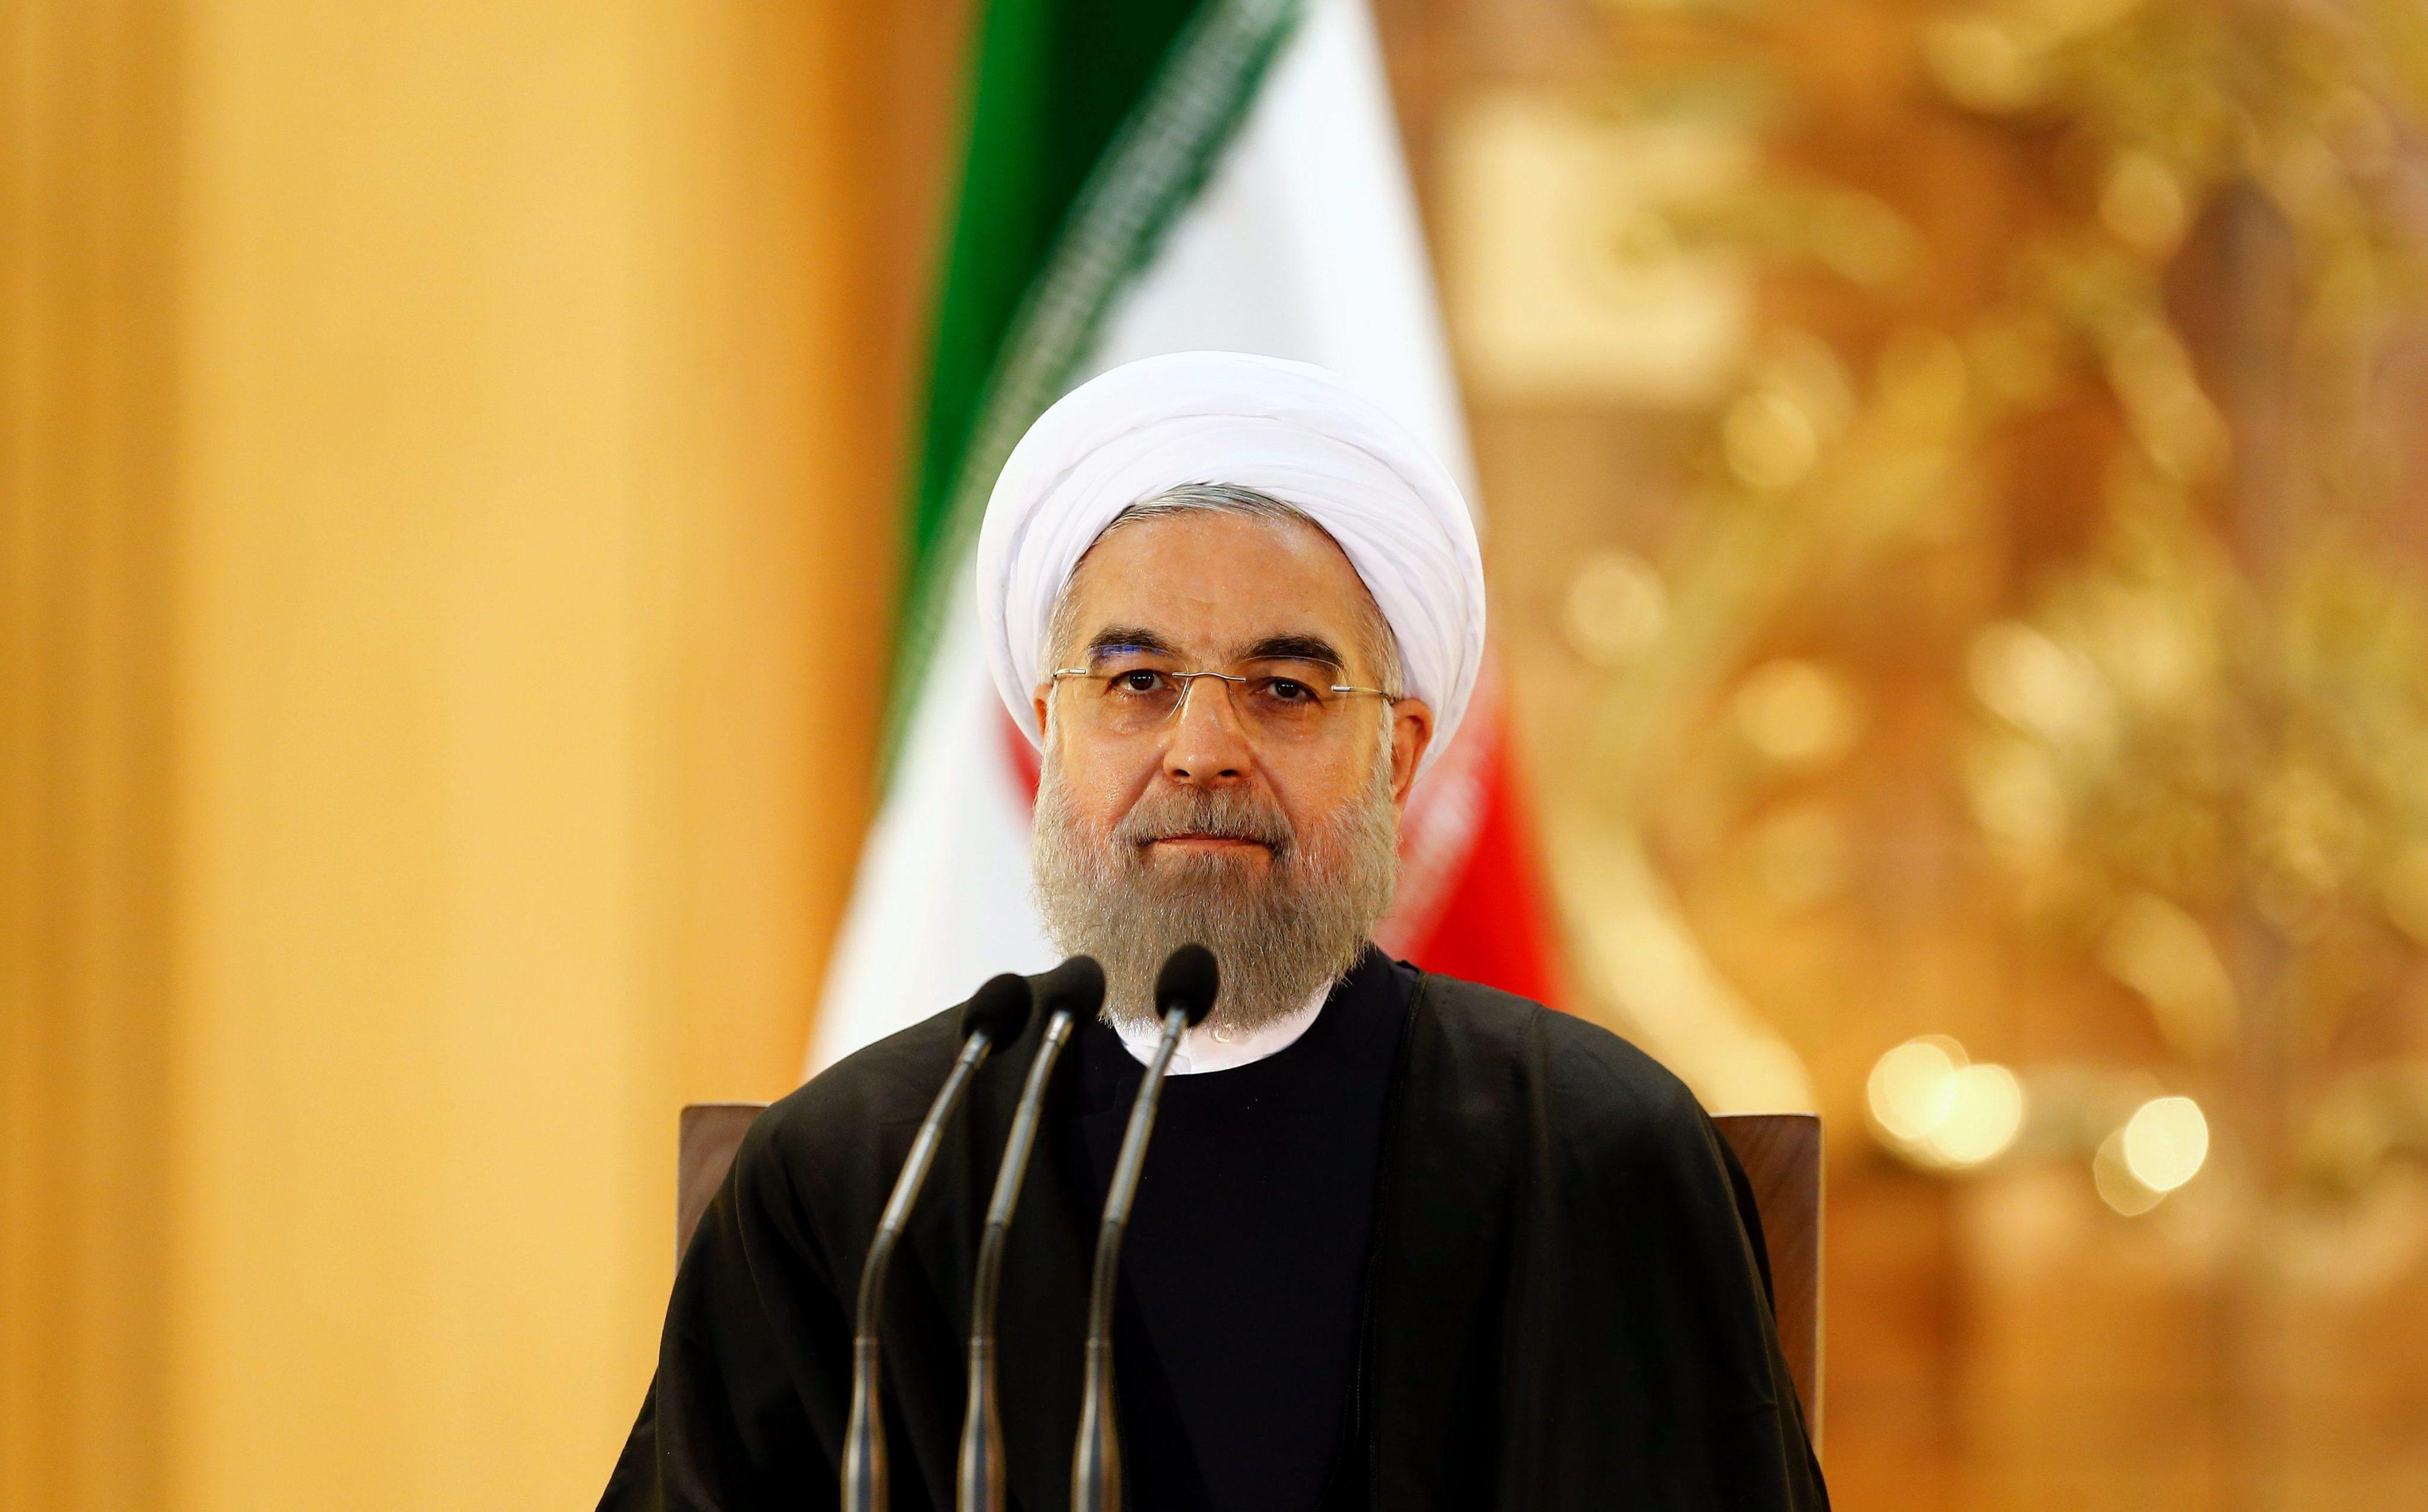 "Irão sai ""vitorioso"" dos protestos dos últimos dias - presidente Rohani"